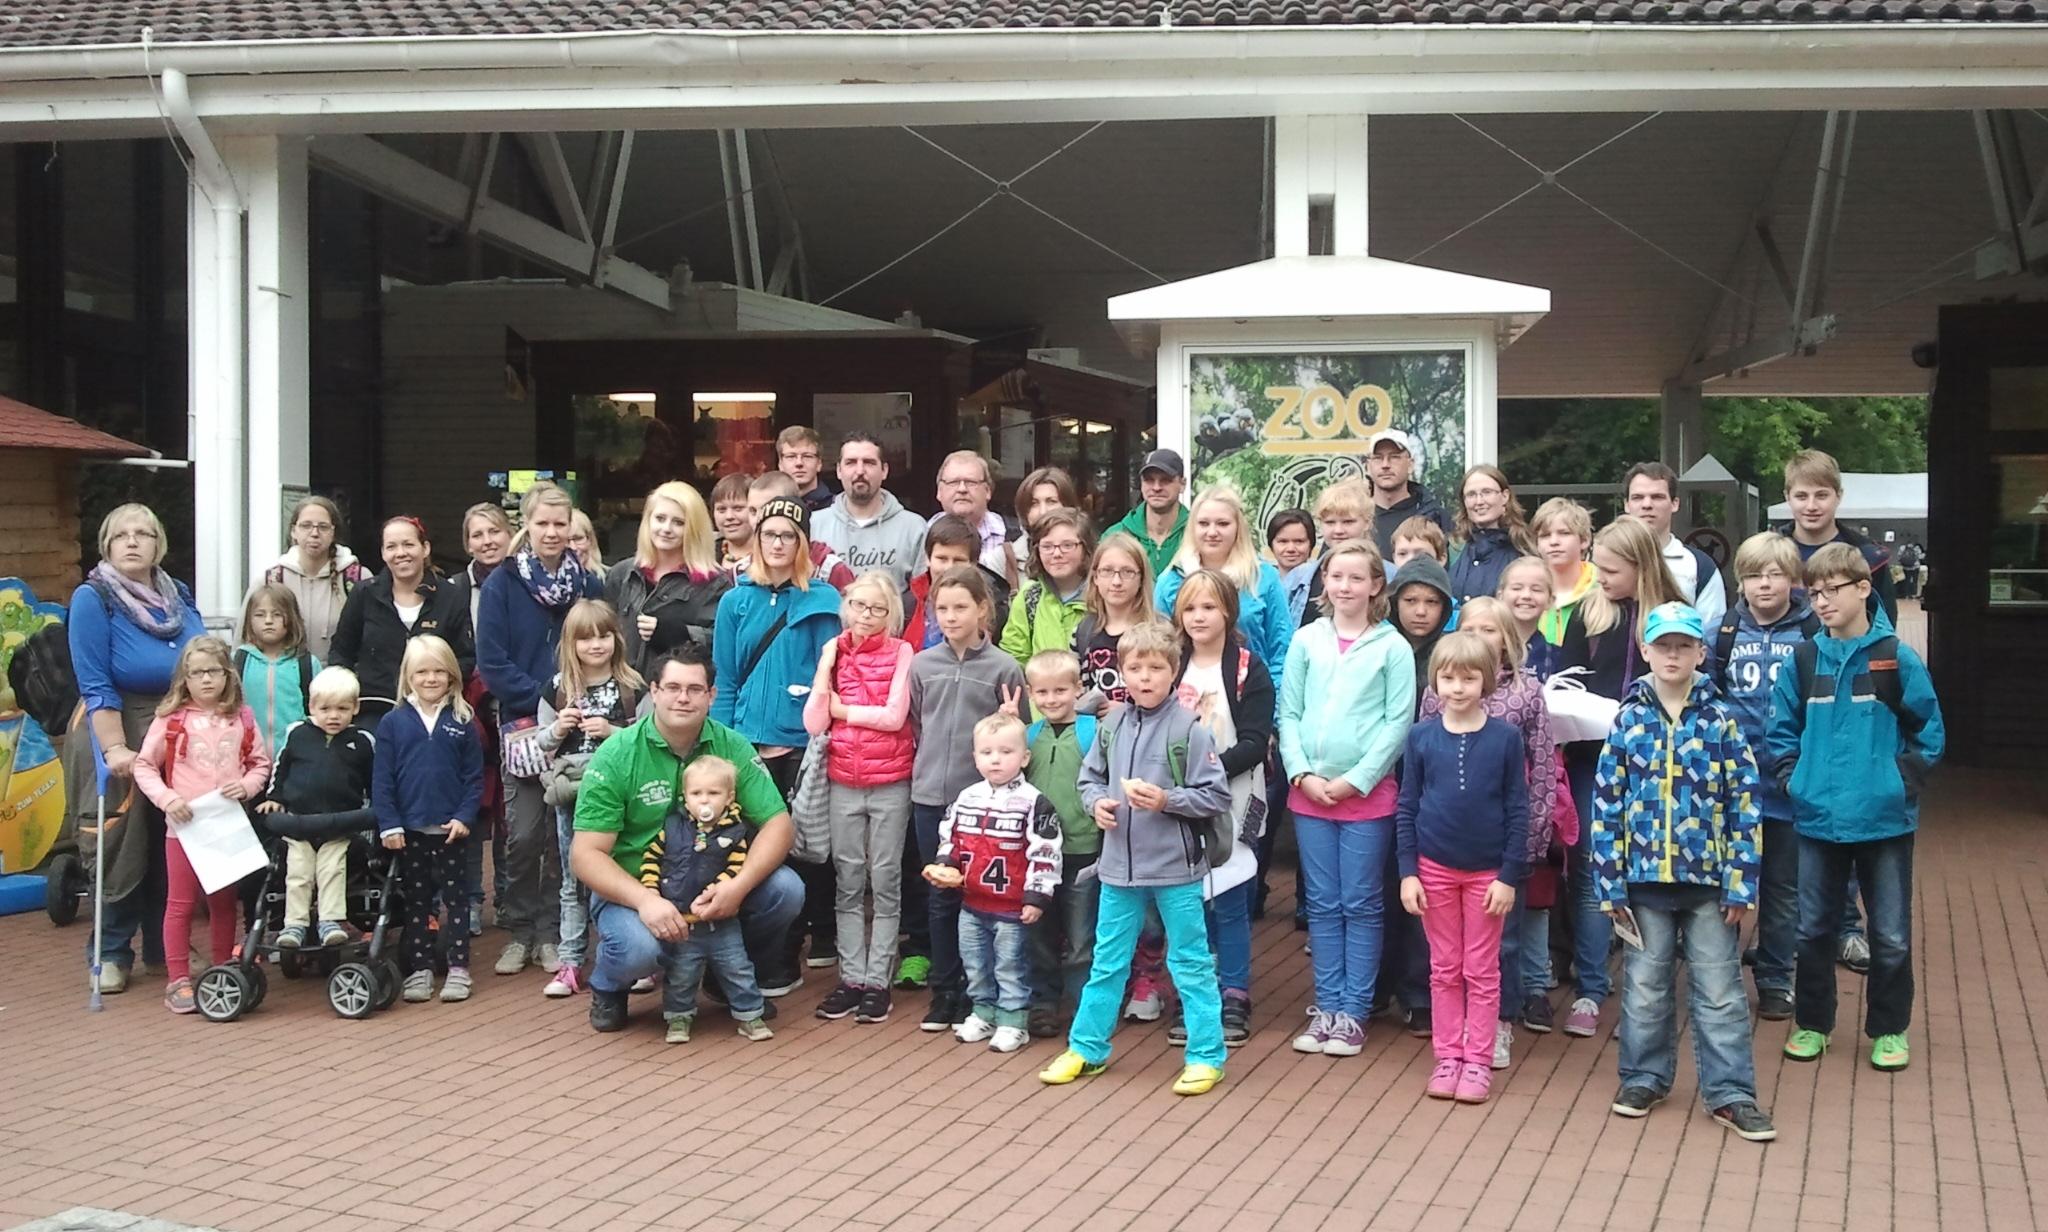 Zoobesuch Dortmund